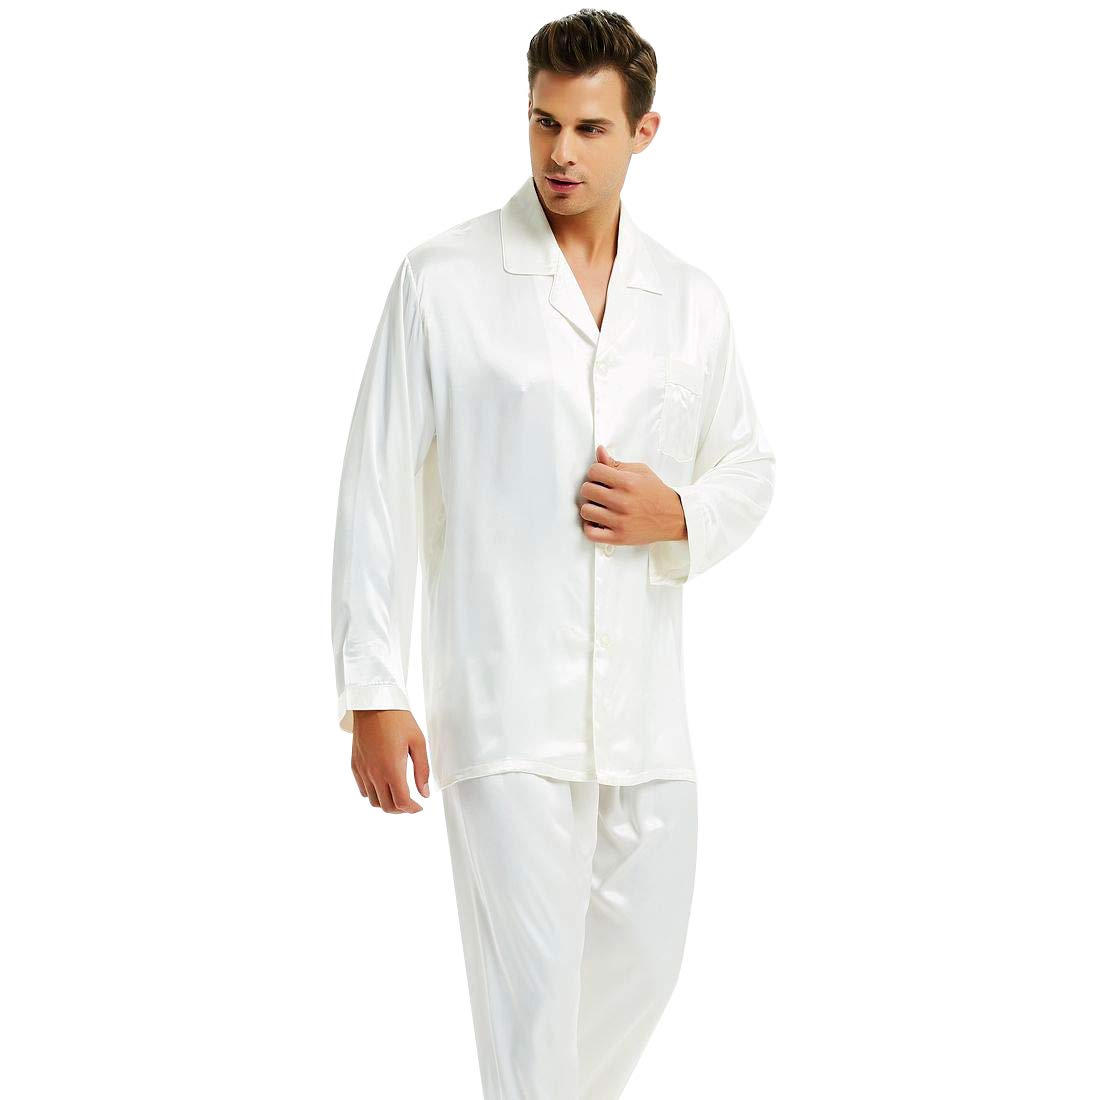 Mens Silk Satin Pajamas Set Sleepwear Loungewear White M